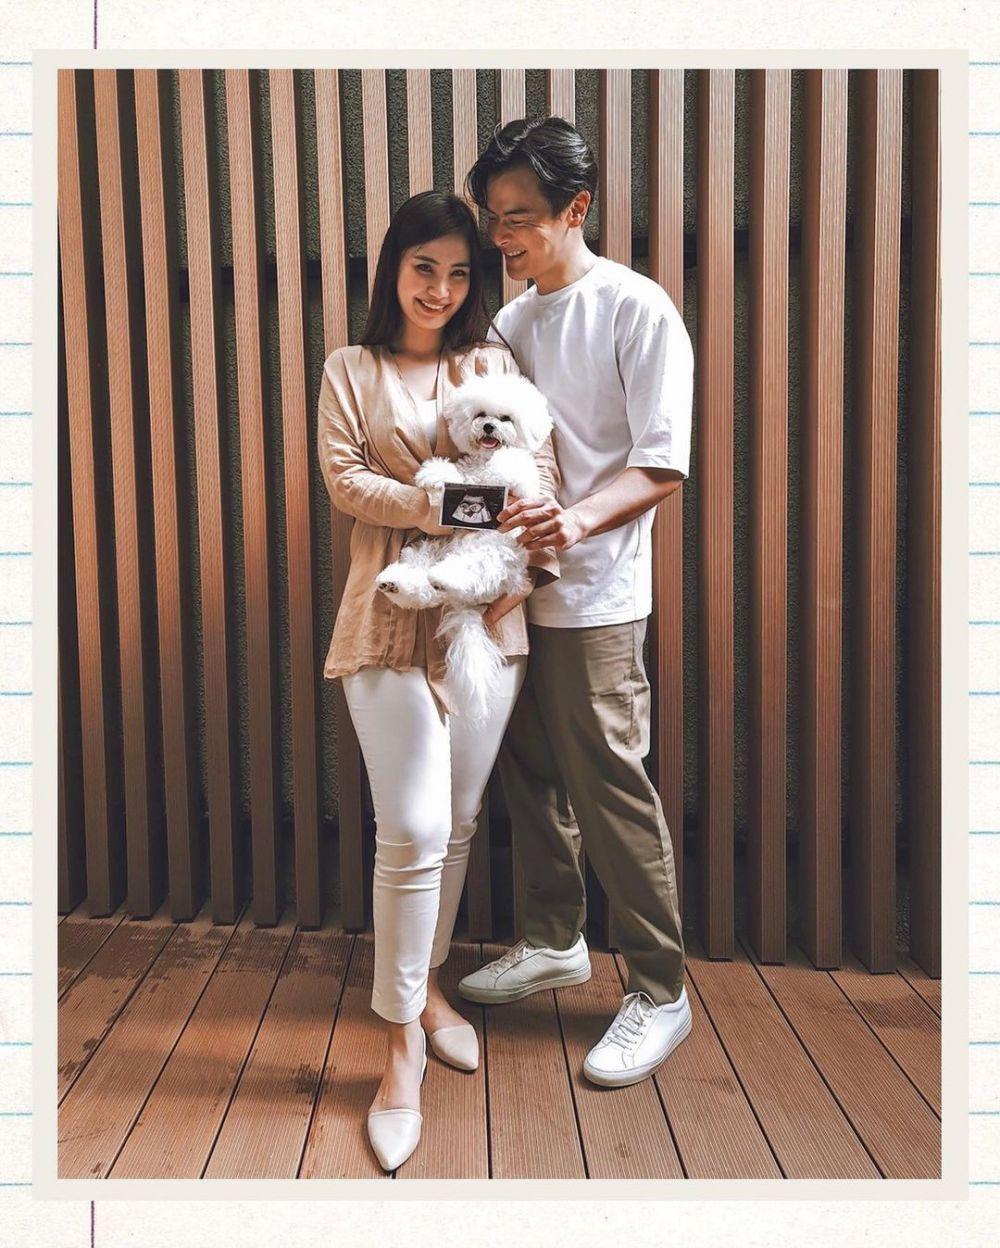 Dion Wiyoko & istri umumkan kehamilan Instagram